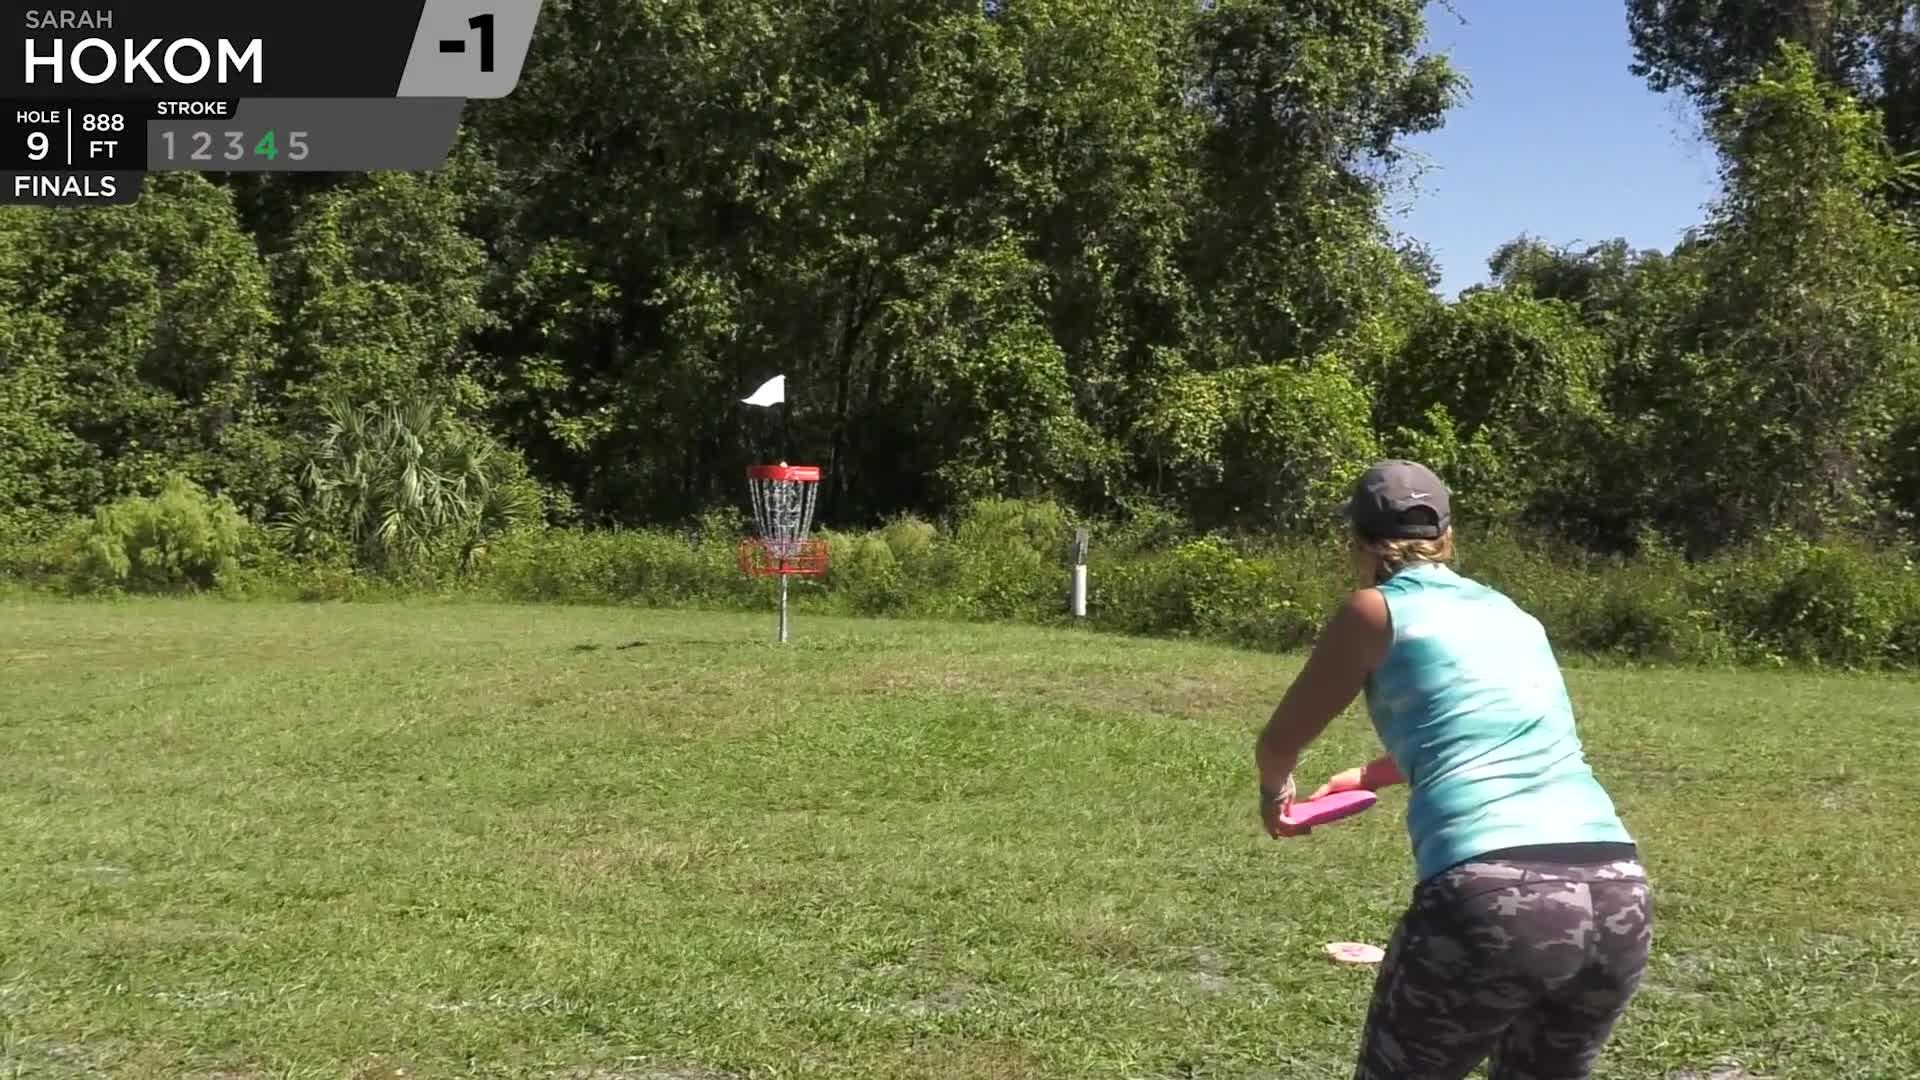 Sports, dgpt, disc golf, disc golf pro tour, sports, FPO Finals 2018 DGPT Championship - F9 | Sarah Hokom hole 9 putt GIFs